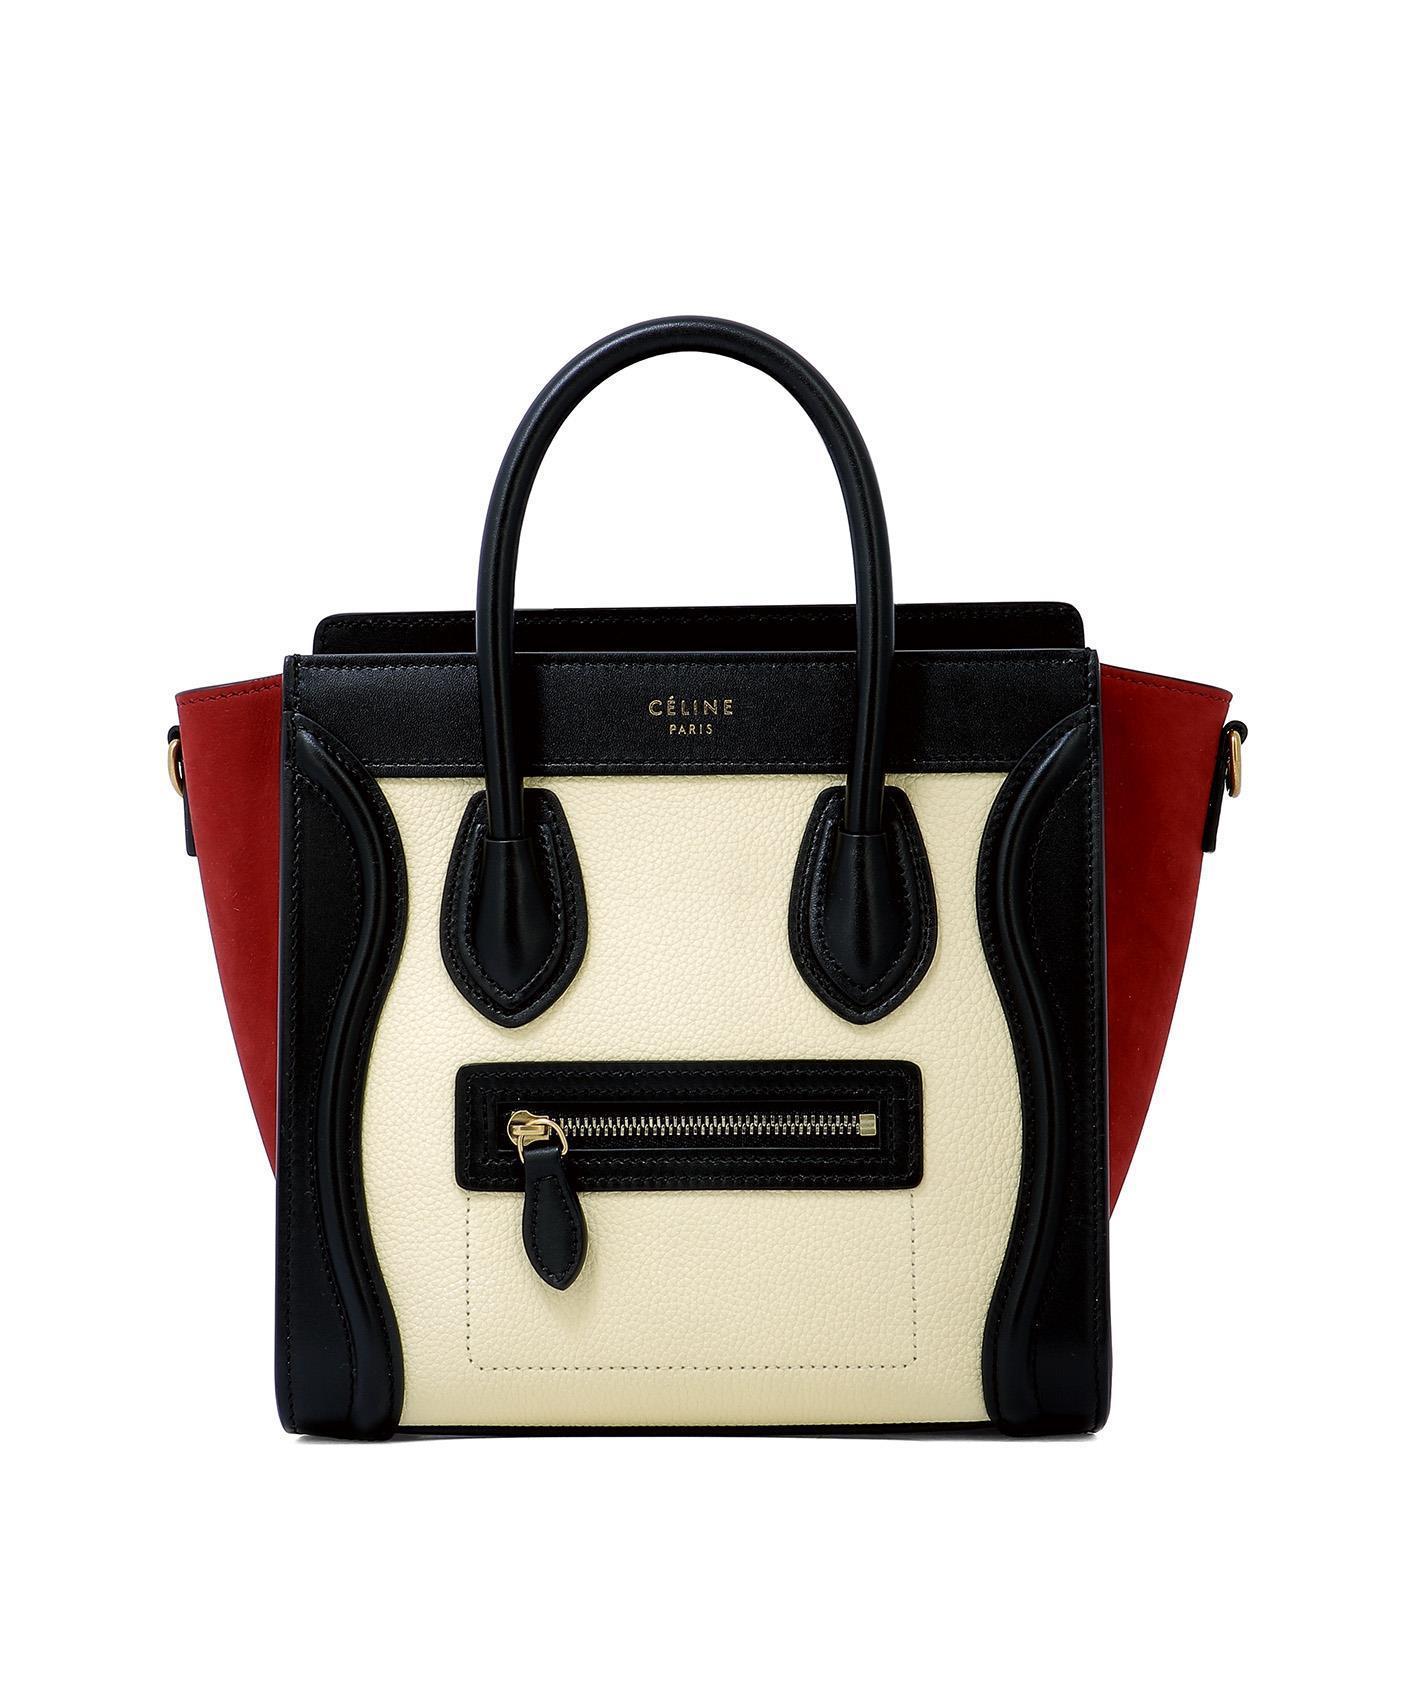 Céline Colour Block Nano Luggage Bag in Black - Lyst 3a86f813d0